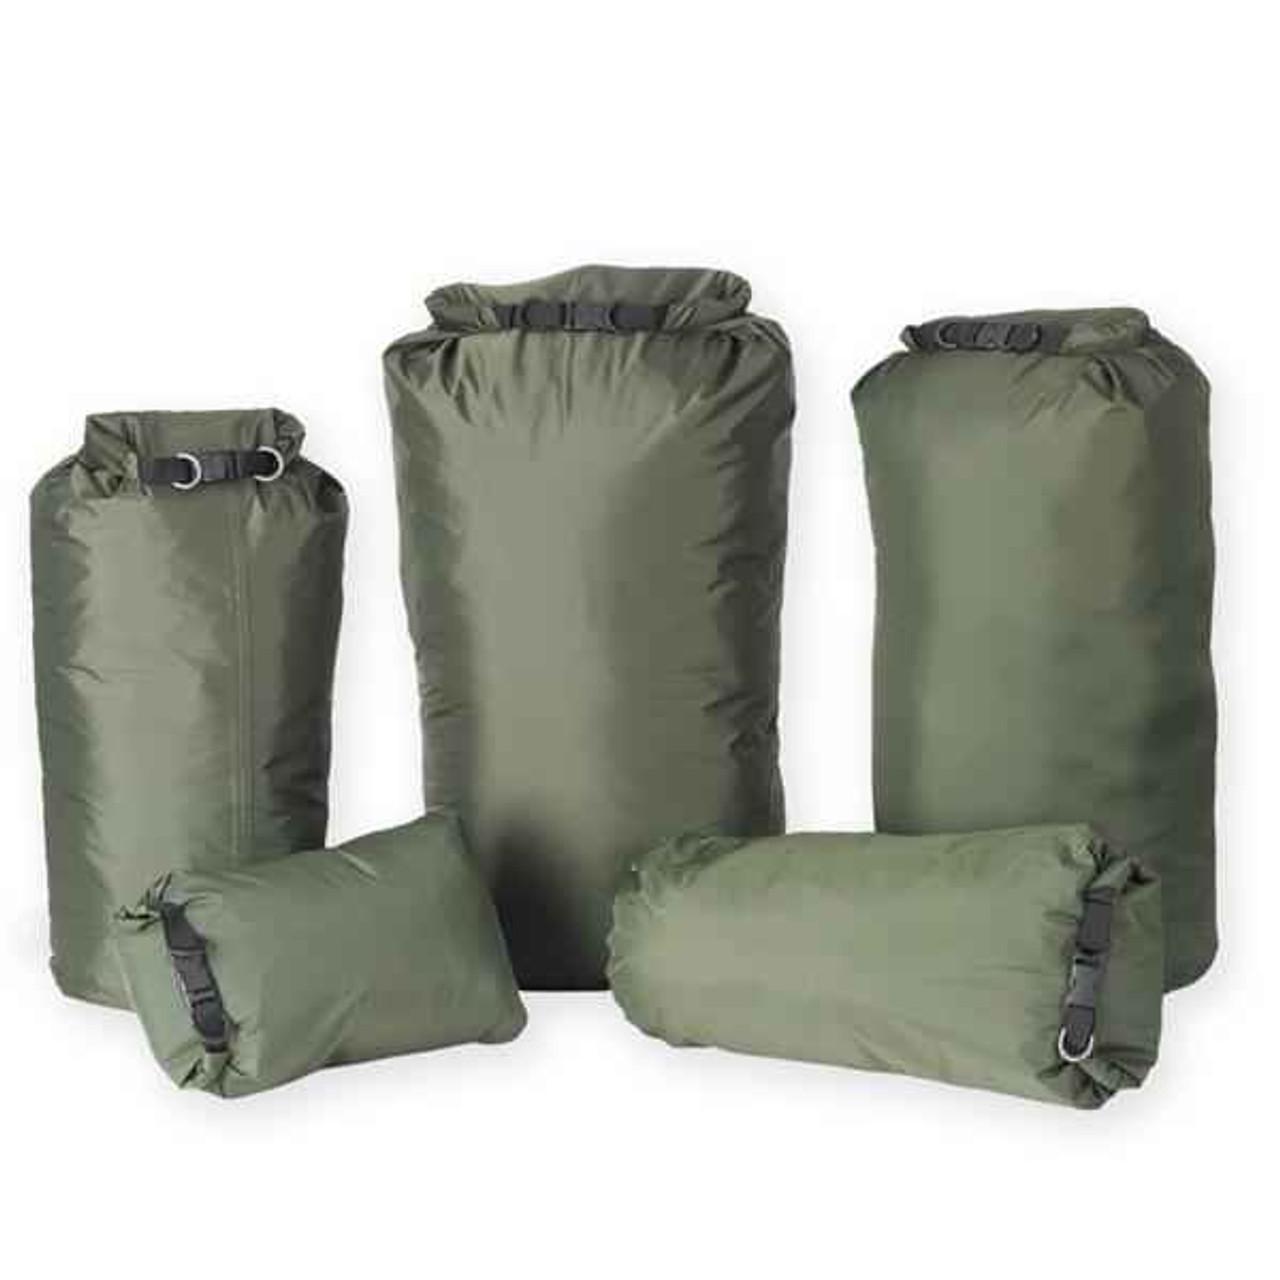 Pro Force Dri-Sak Waterproof Bag - Small, Olive